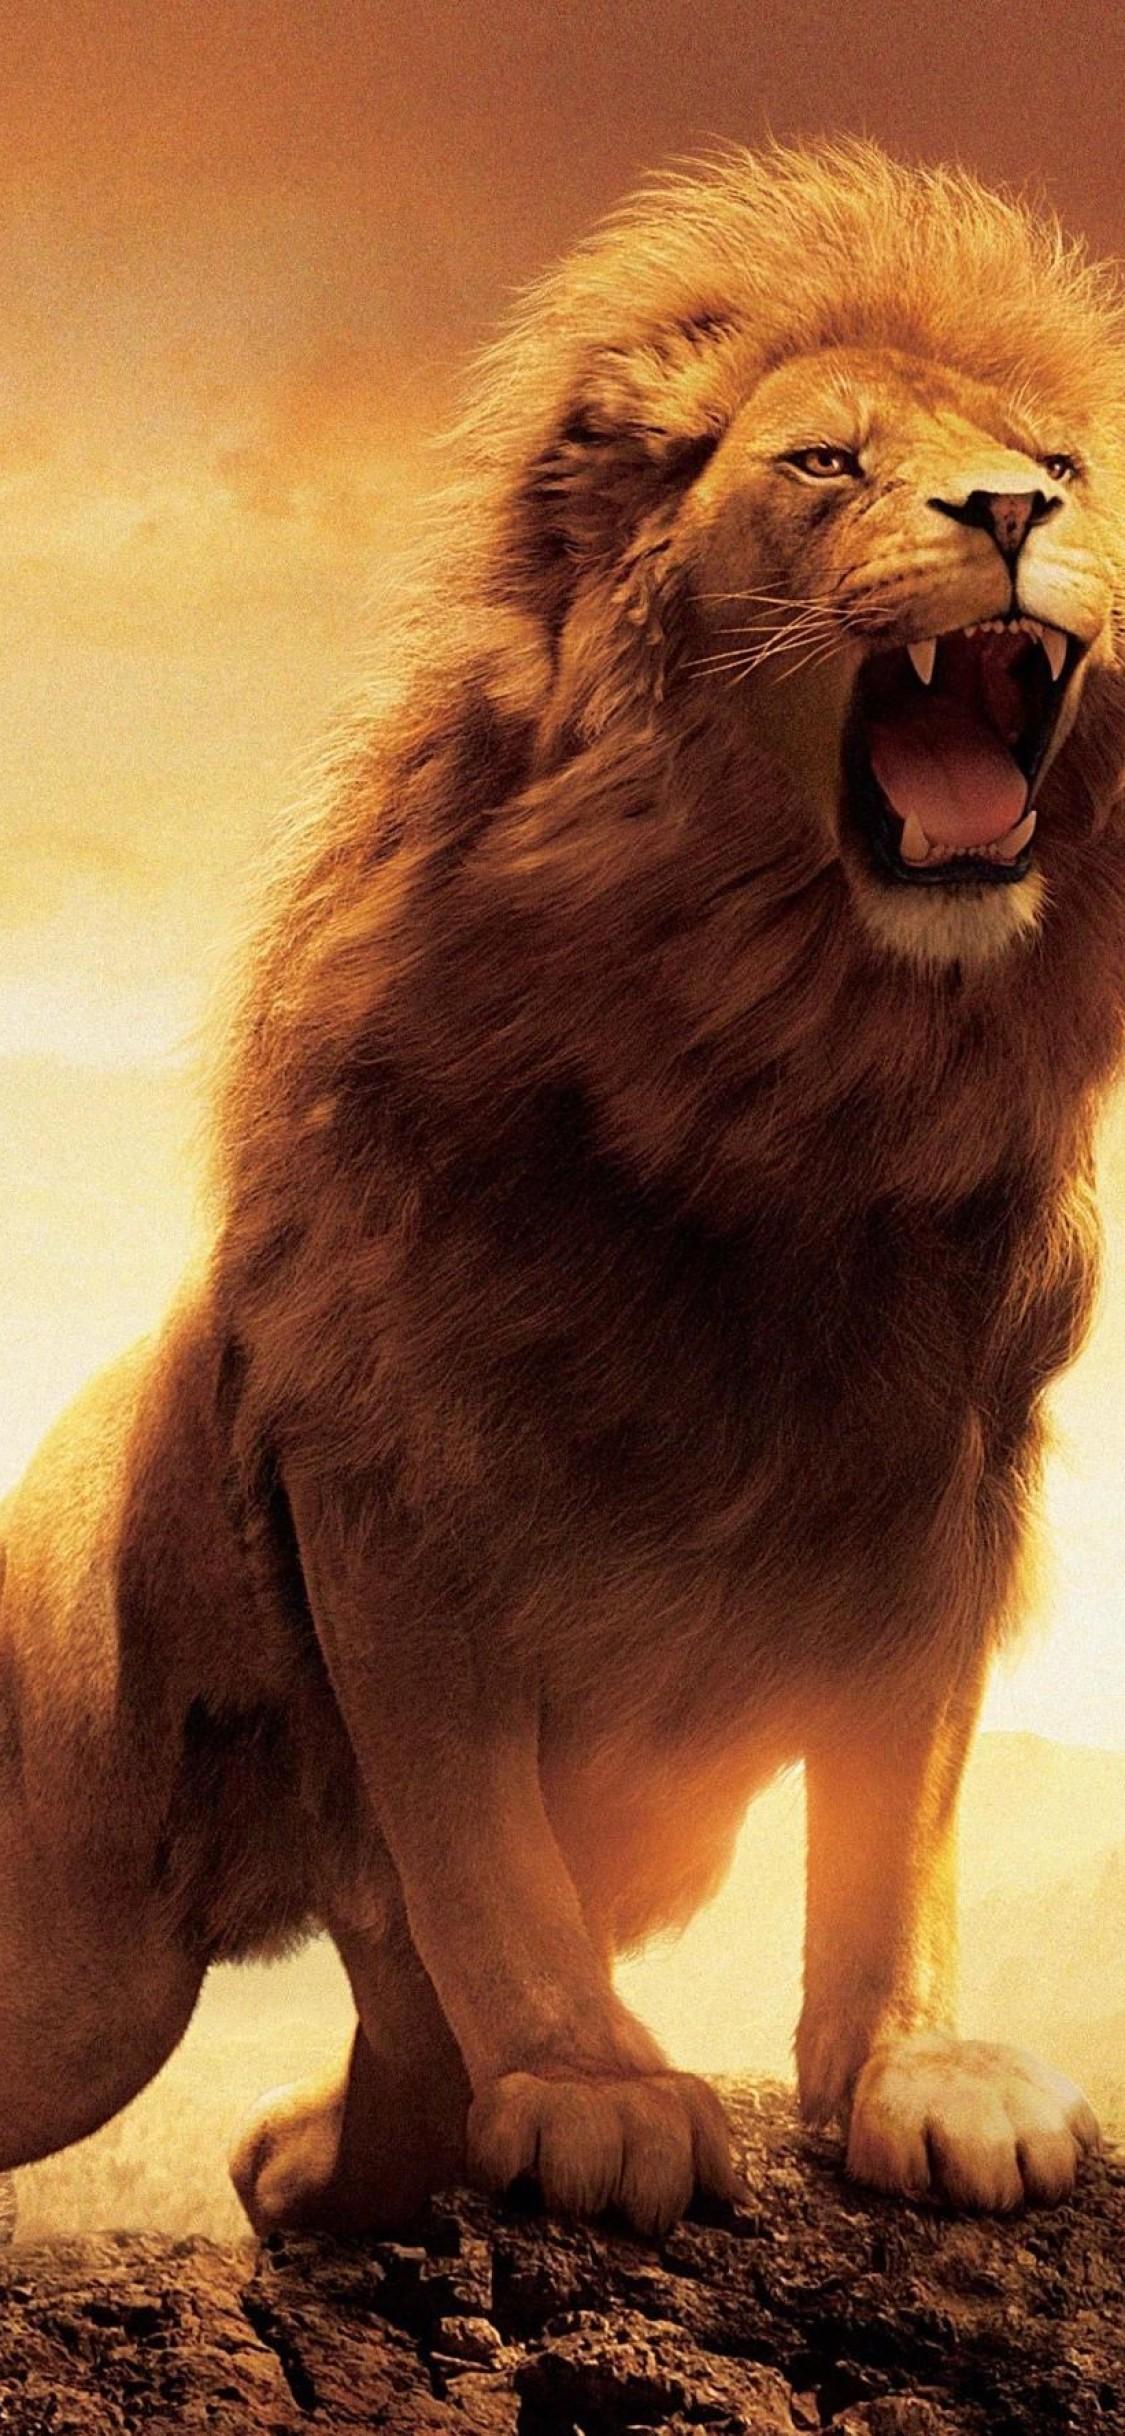 Iphone Ultra Hd Lion Wallpaper 4k , HD Wallpaper & Backgrounds